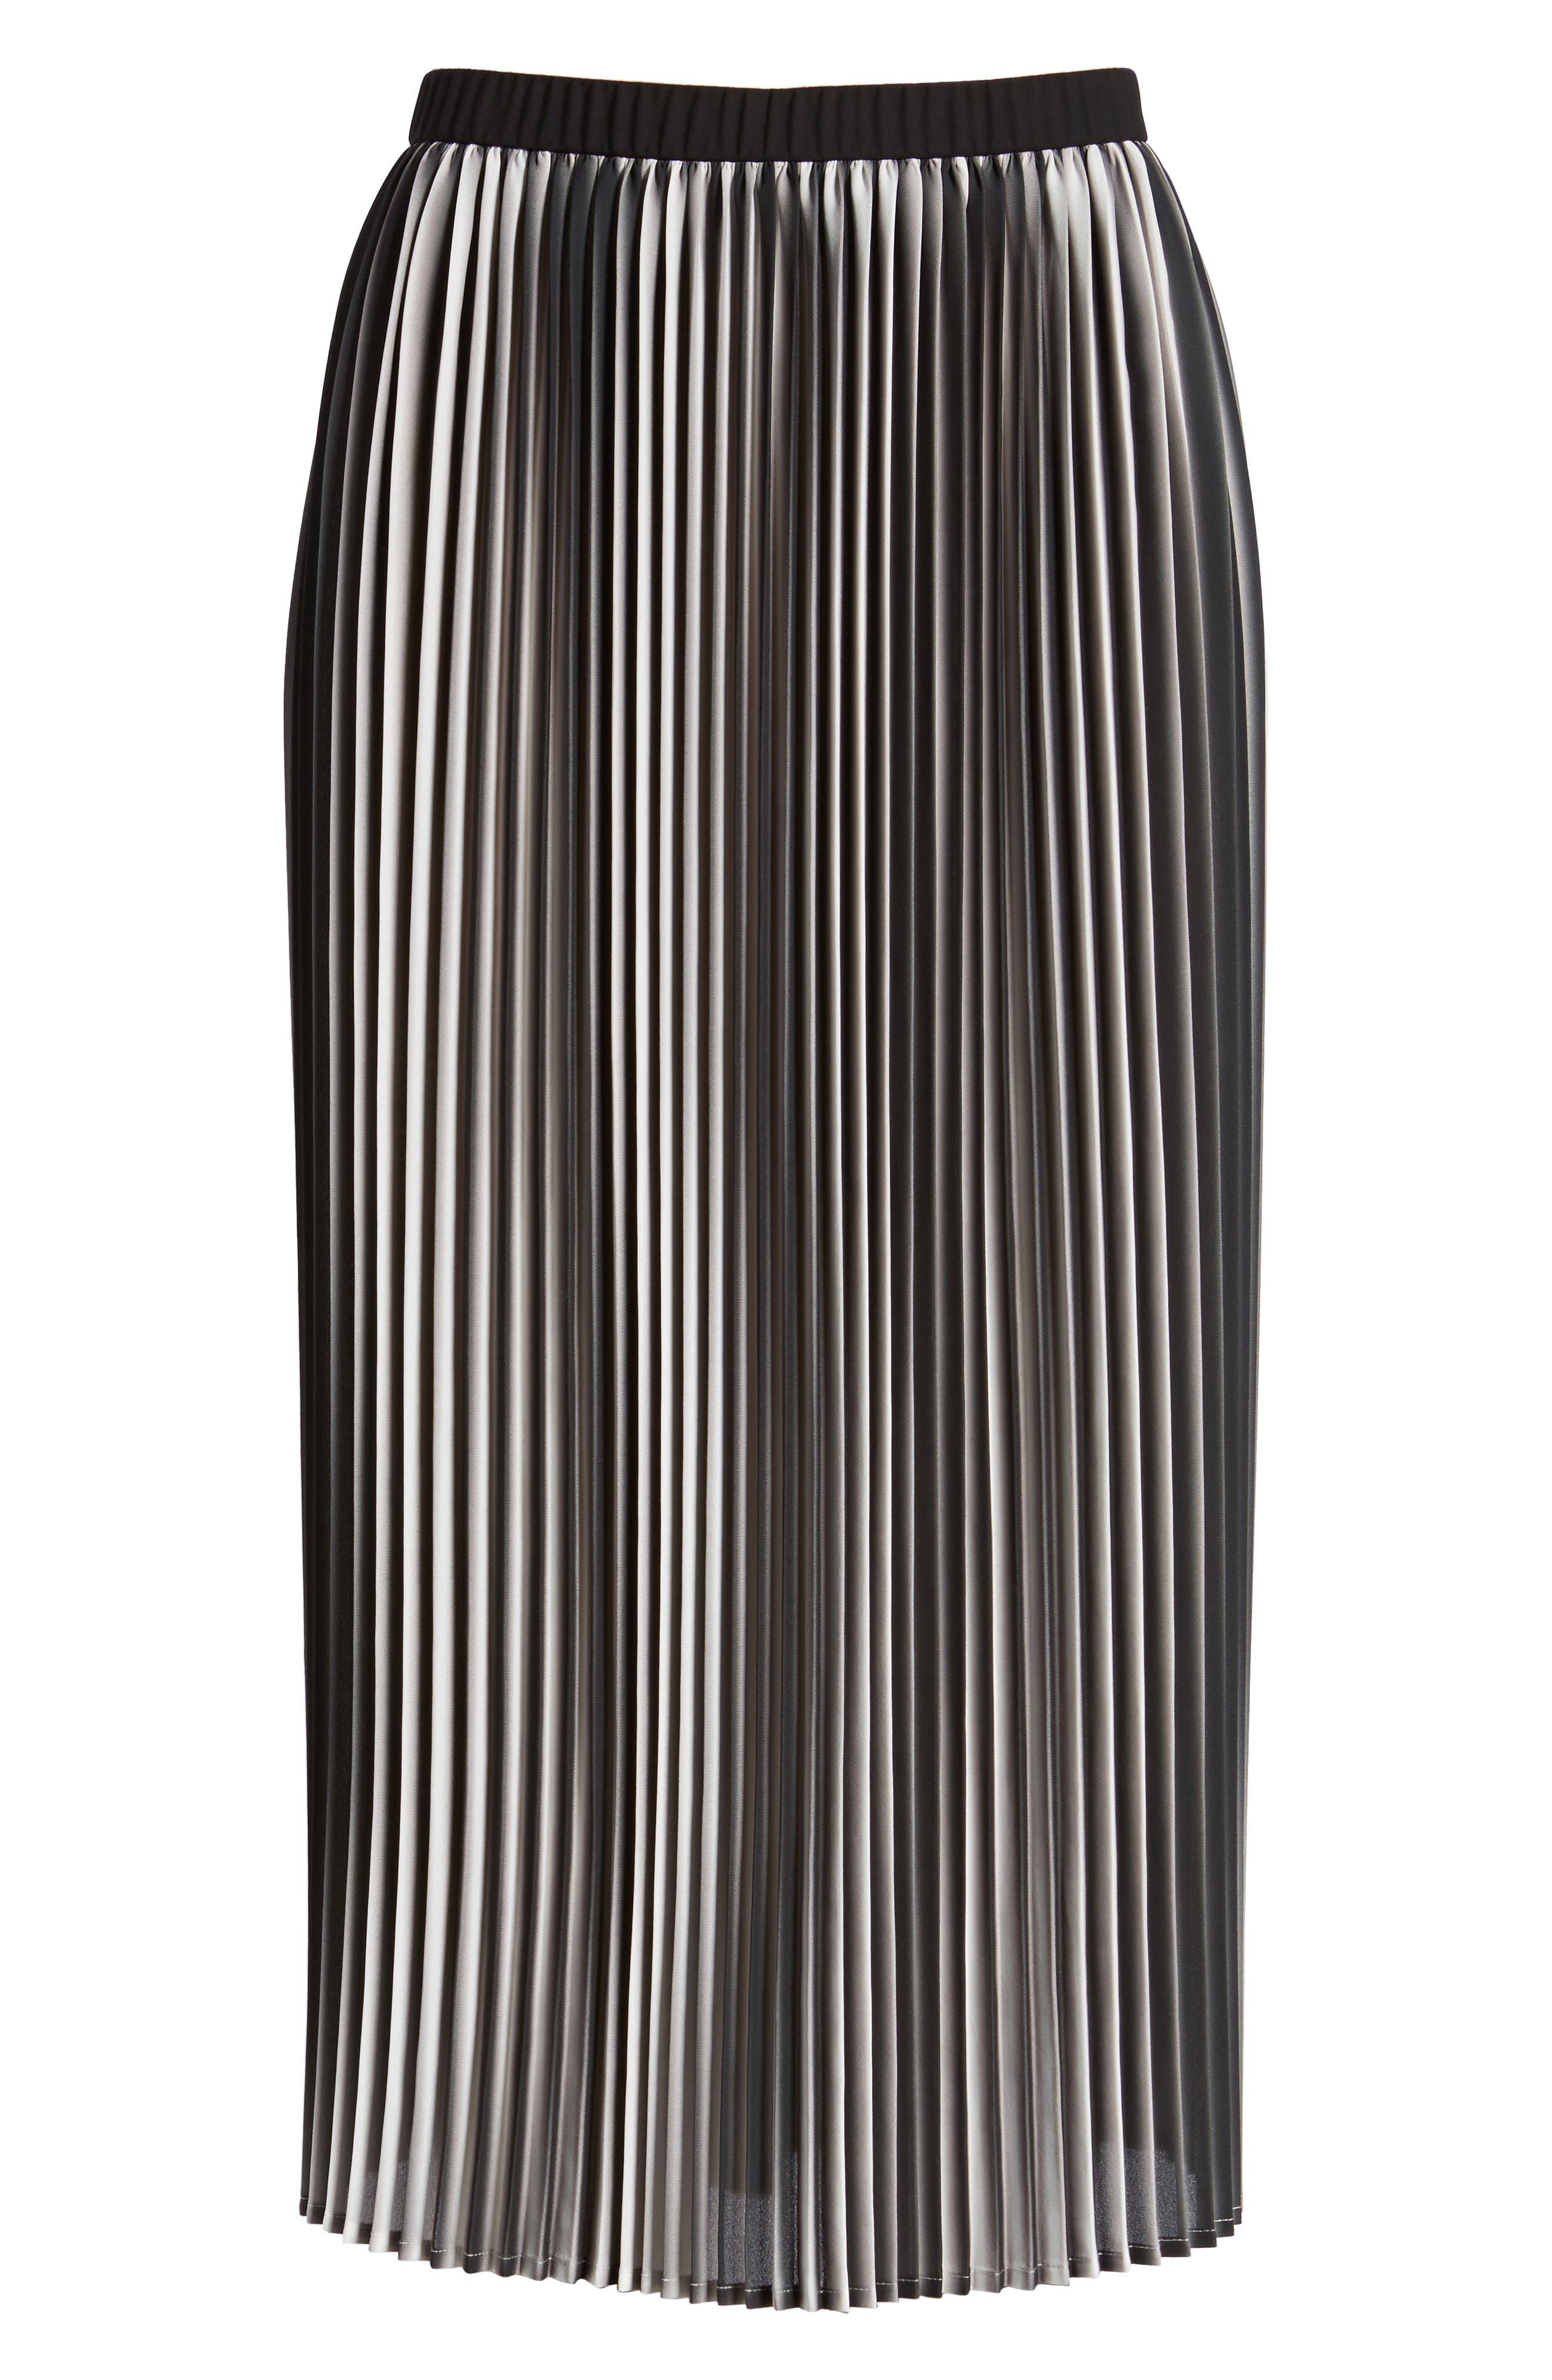 Printed Pleated Skirt,                             Alternate thumbnail 6, color,                             105